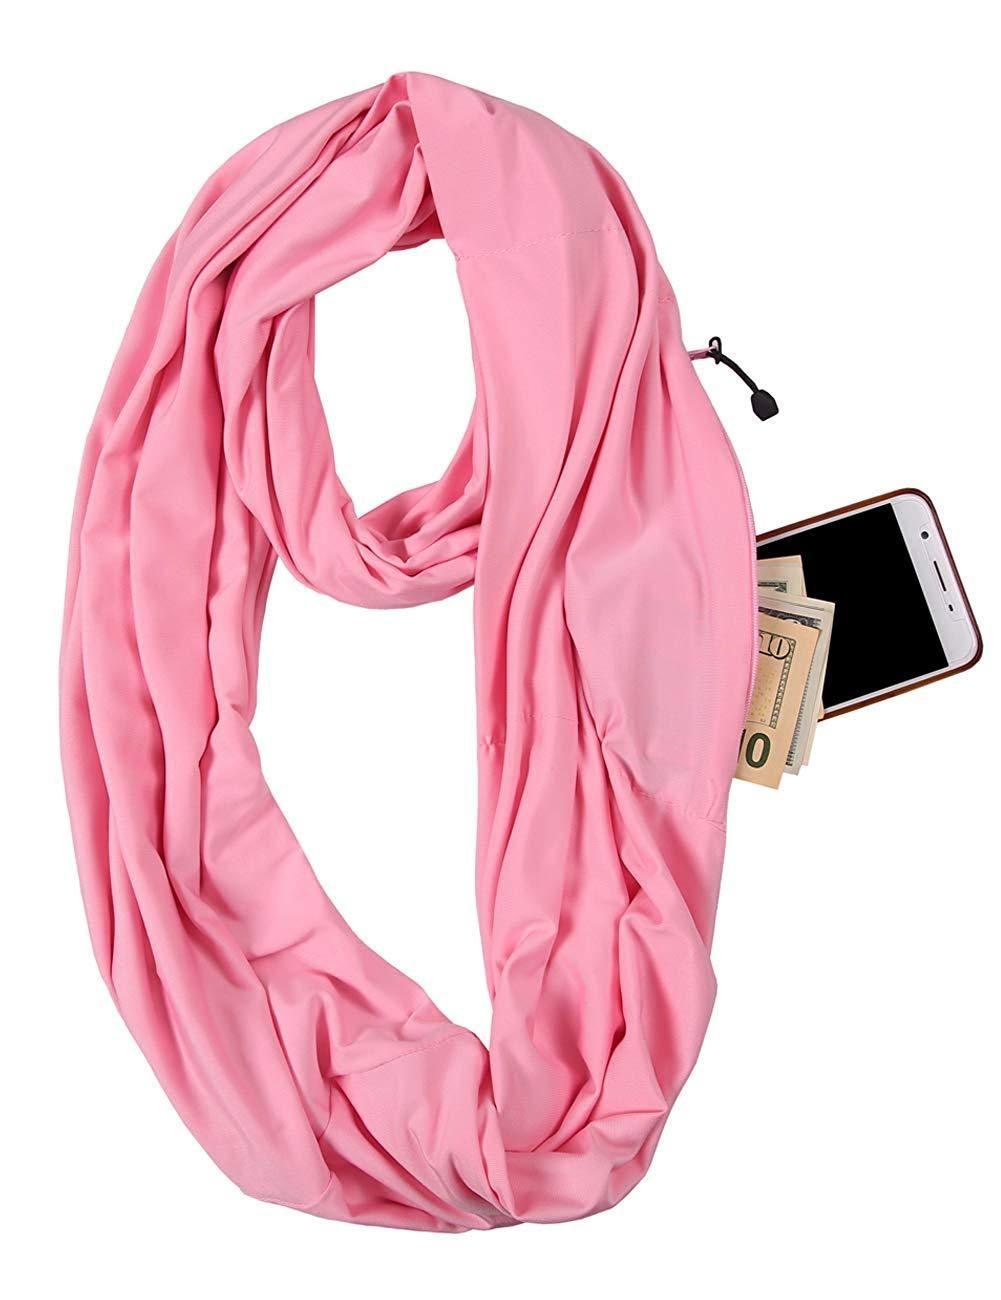 aab3e22f5b767 JOKHOO Infinity Scarf Wrap with Secret Hidden Zipper Pocket, Best Travel  Scarfs